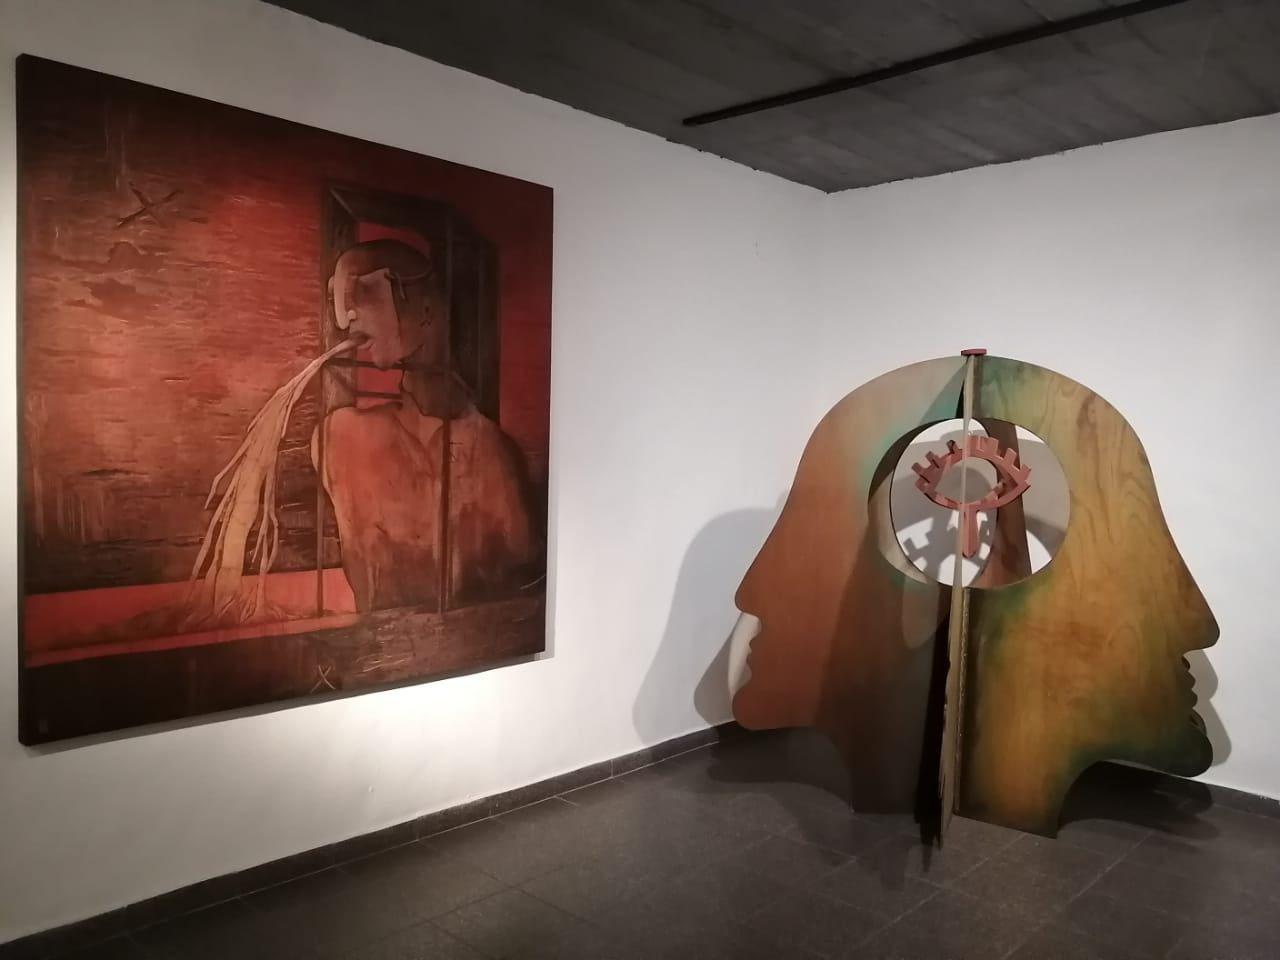 Art at the Museo del Barro